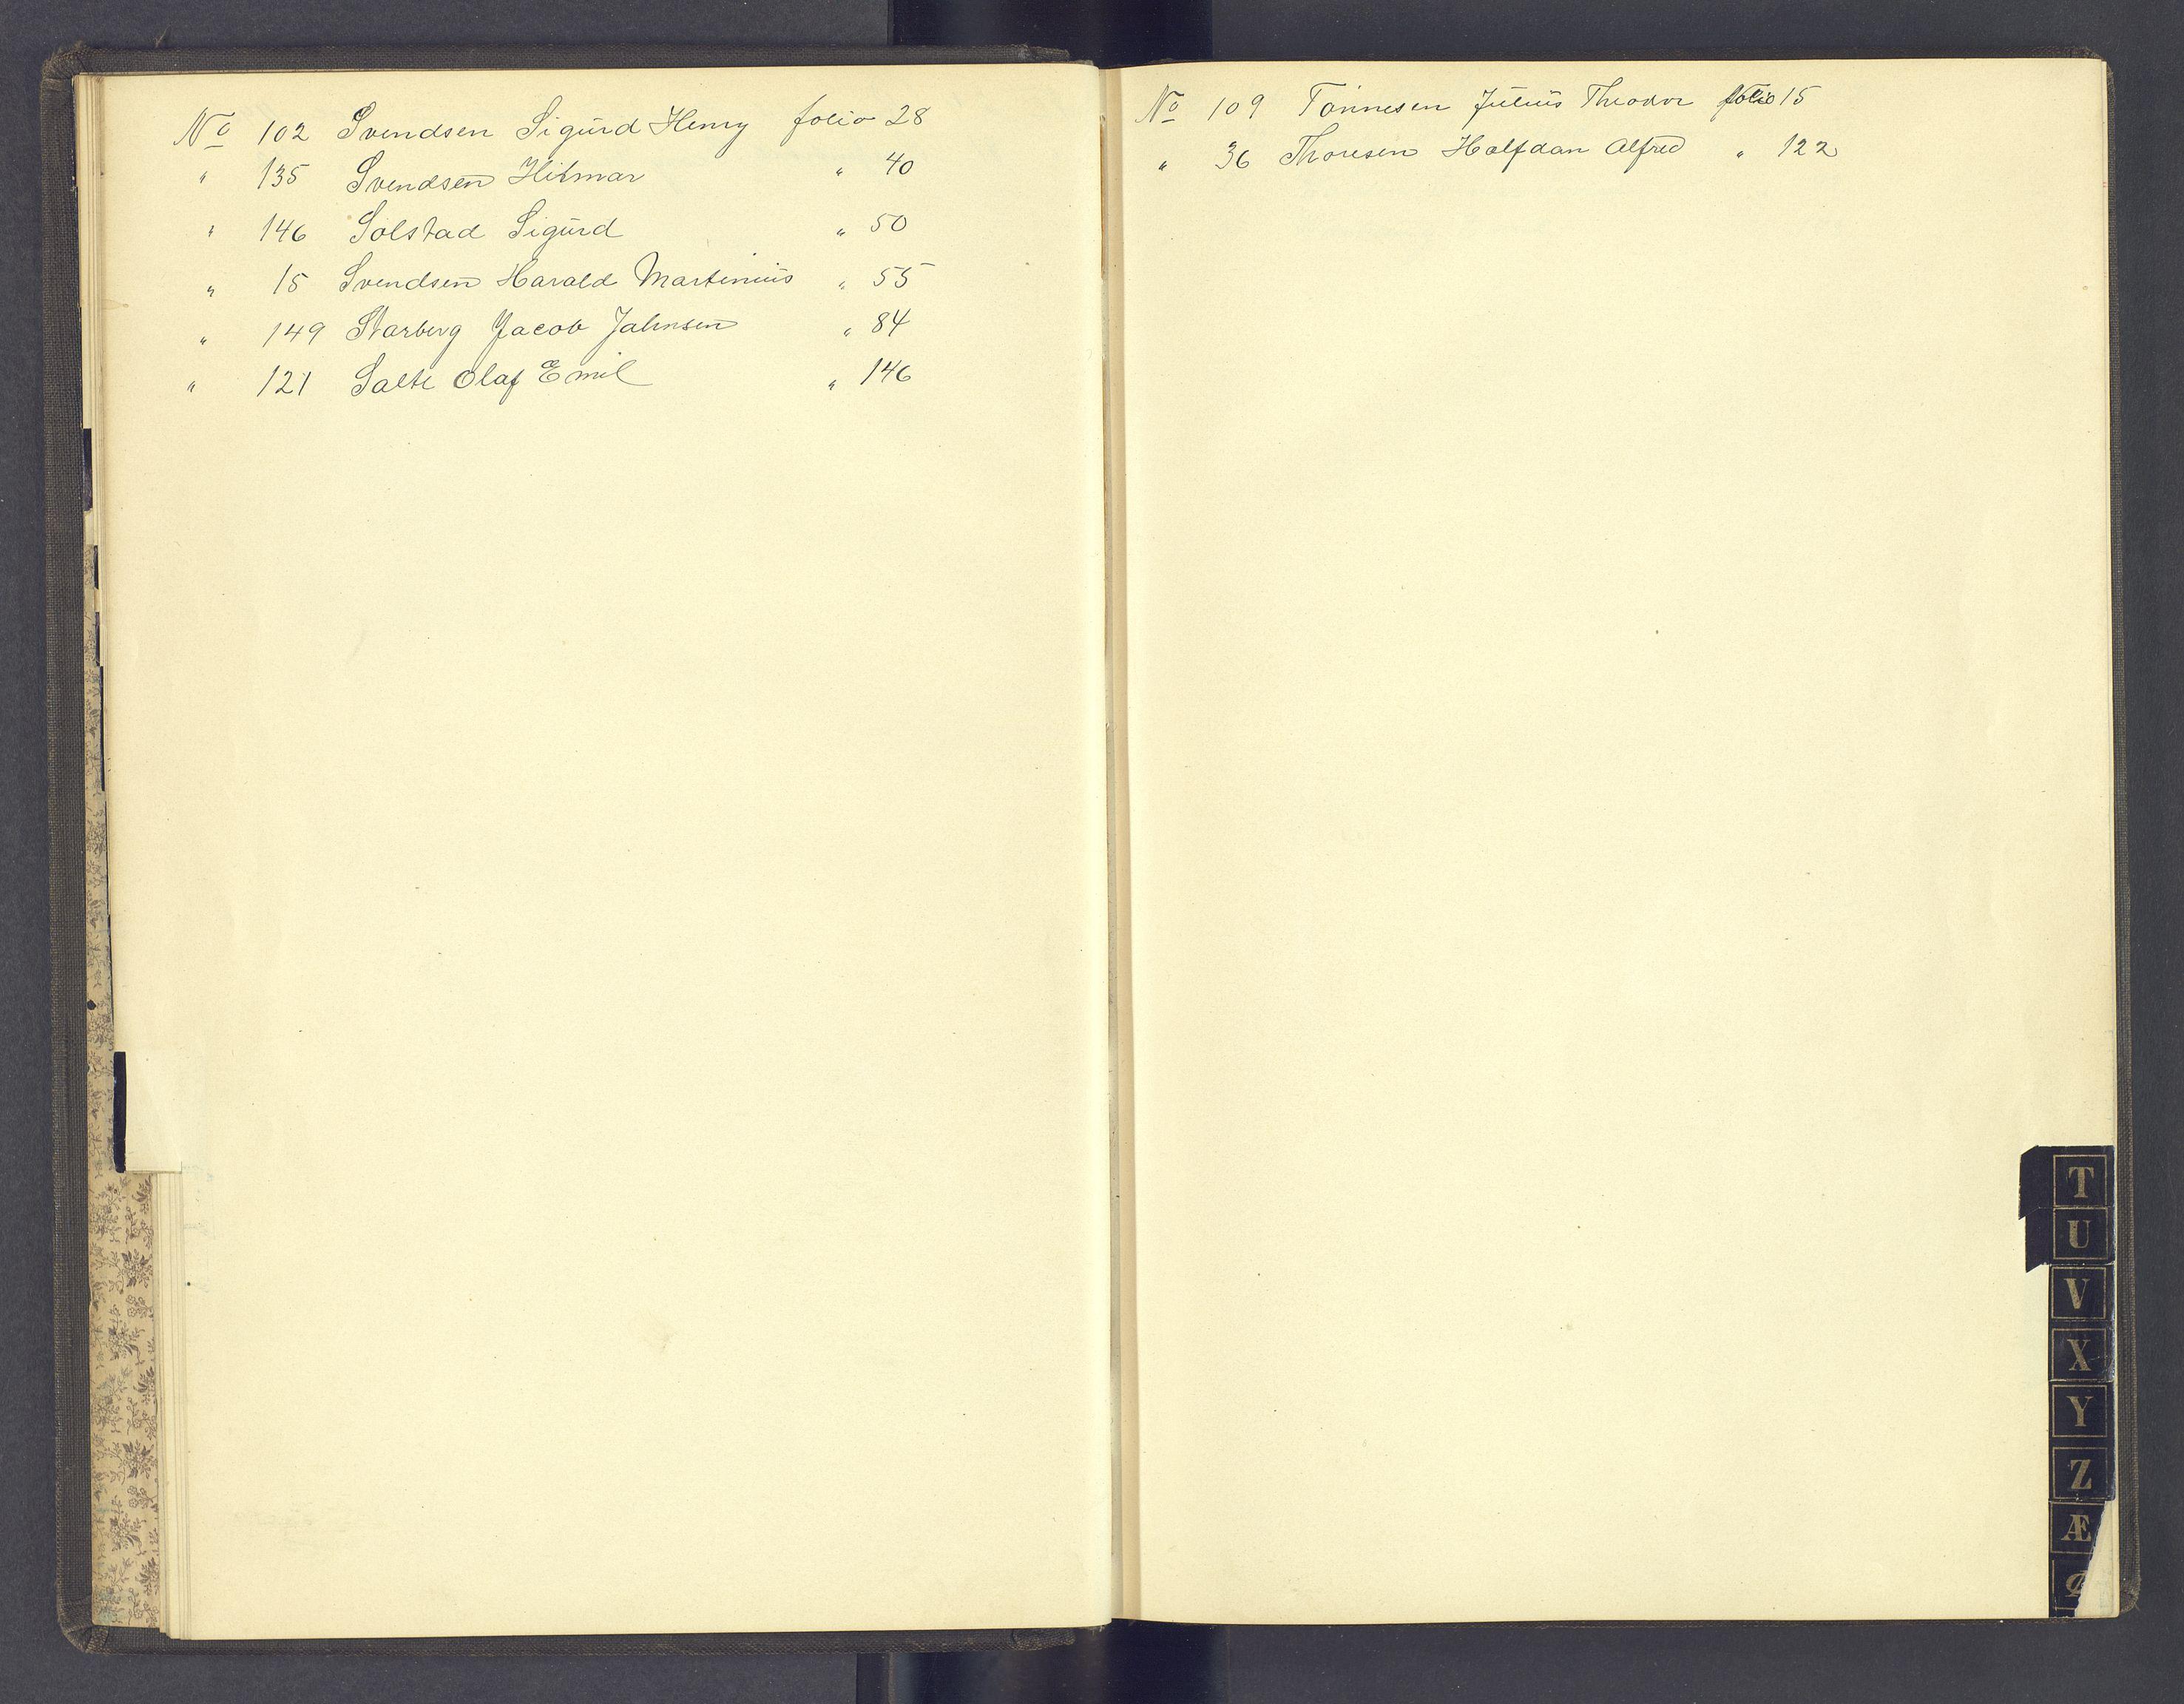 SAH, Toftes Gave, F/Fc/L0005: Elevprotokoll, 1897-1900, s. upaginert